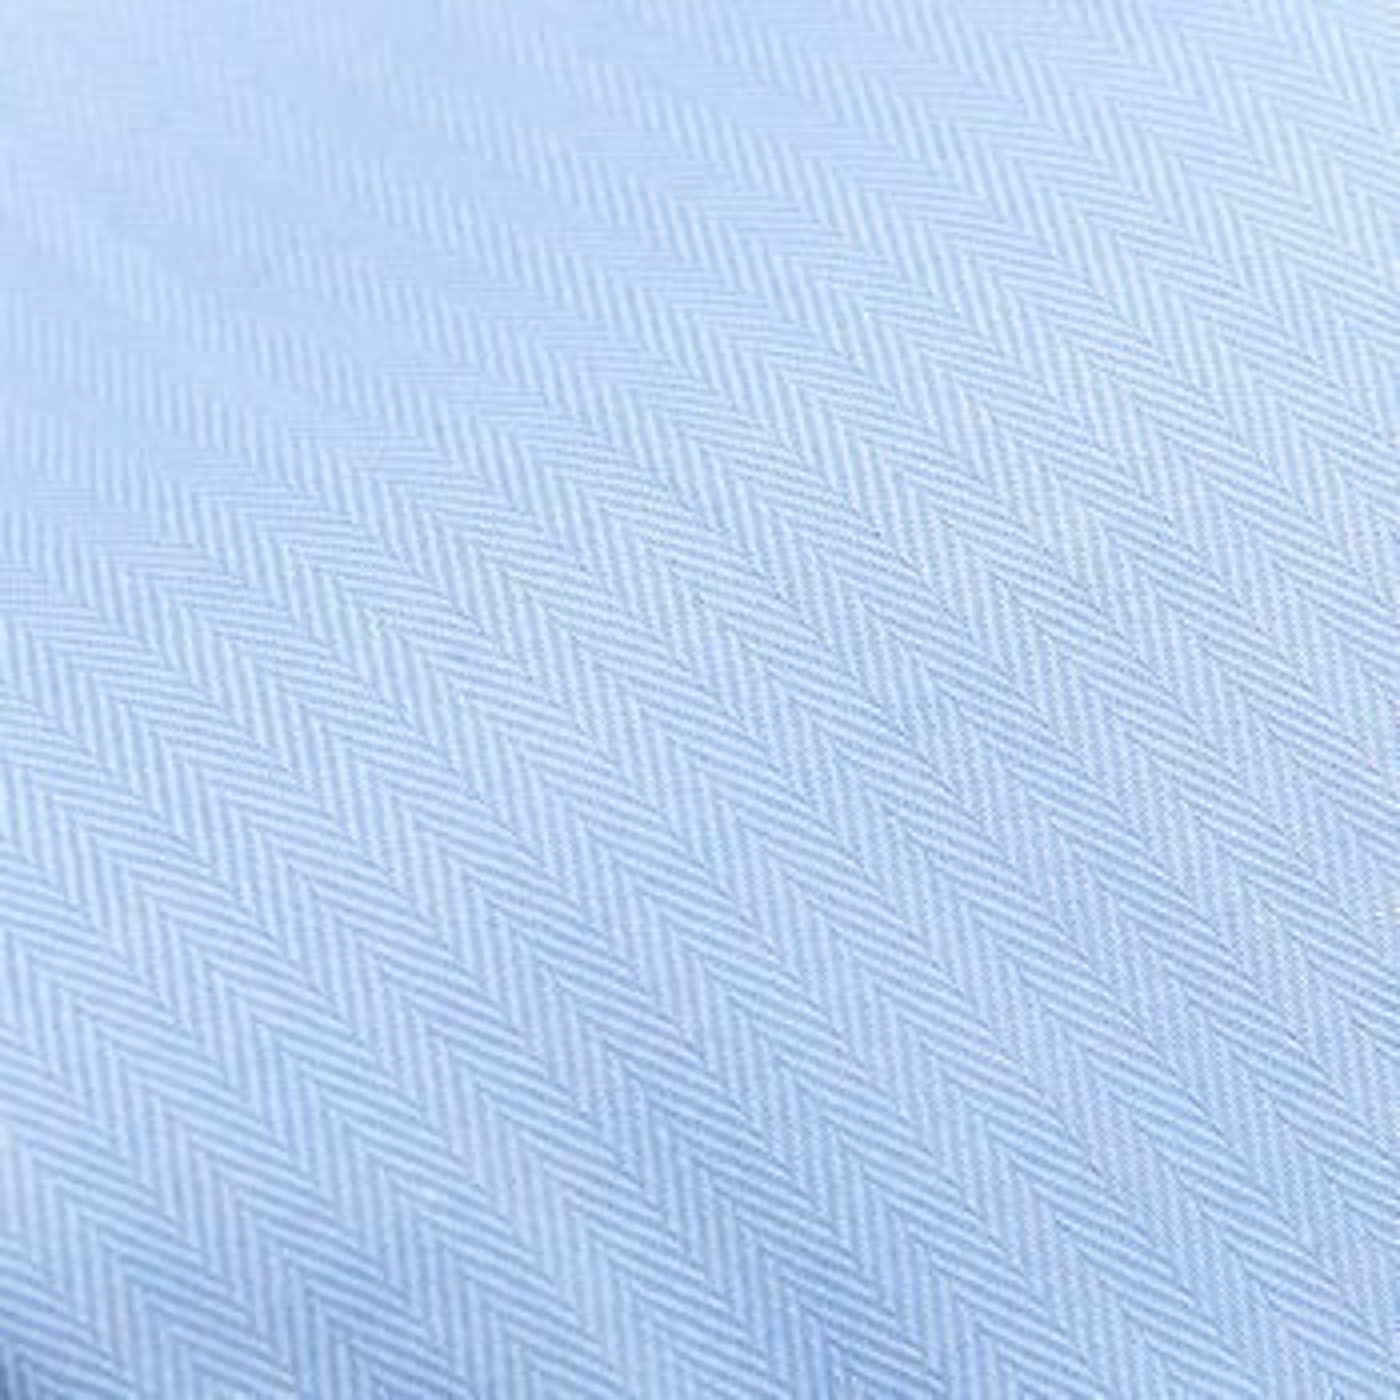 Mazzarelli Blue Cotton Herringbone Cutaway Slim Shirt Fabric